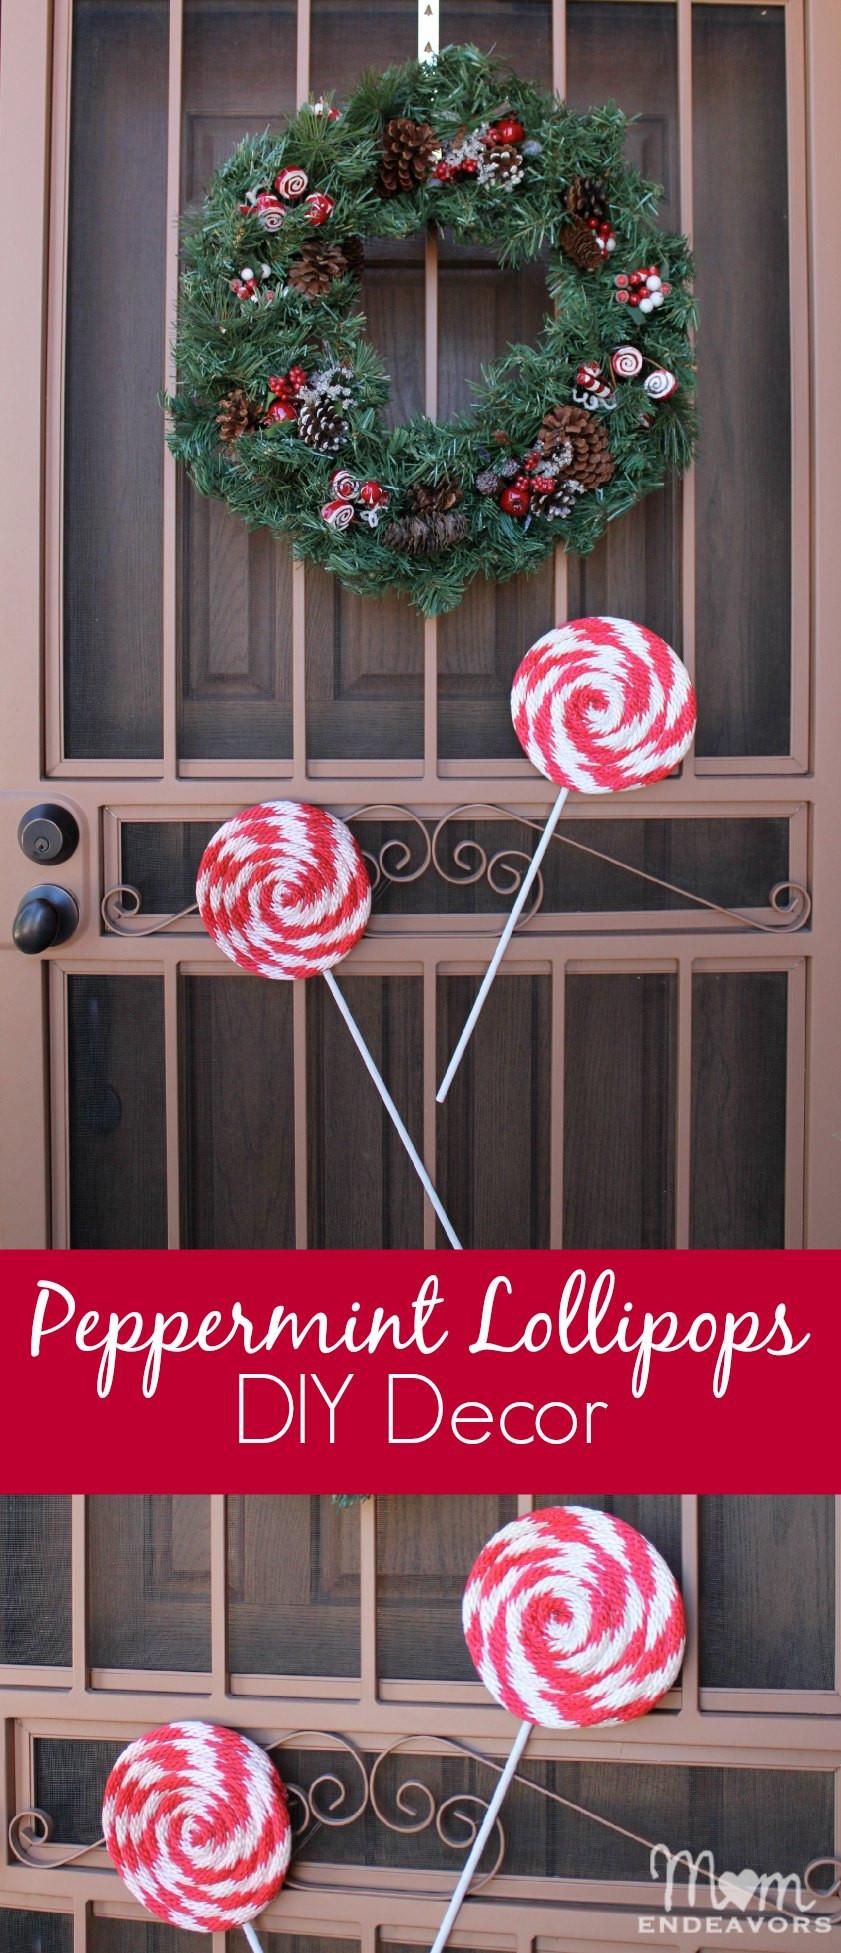 Best ideas about DIY Christmas Decor . Save or Pin DIY Peppermint Lollipops Christmas Decor Now.